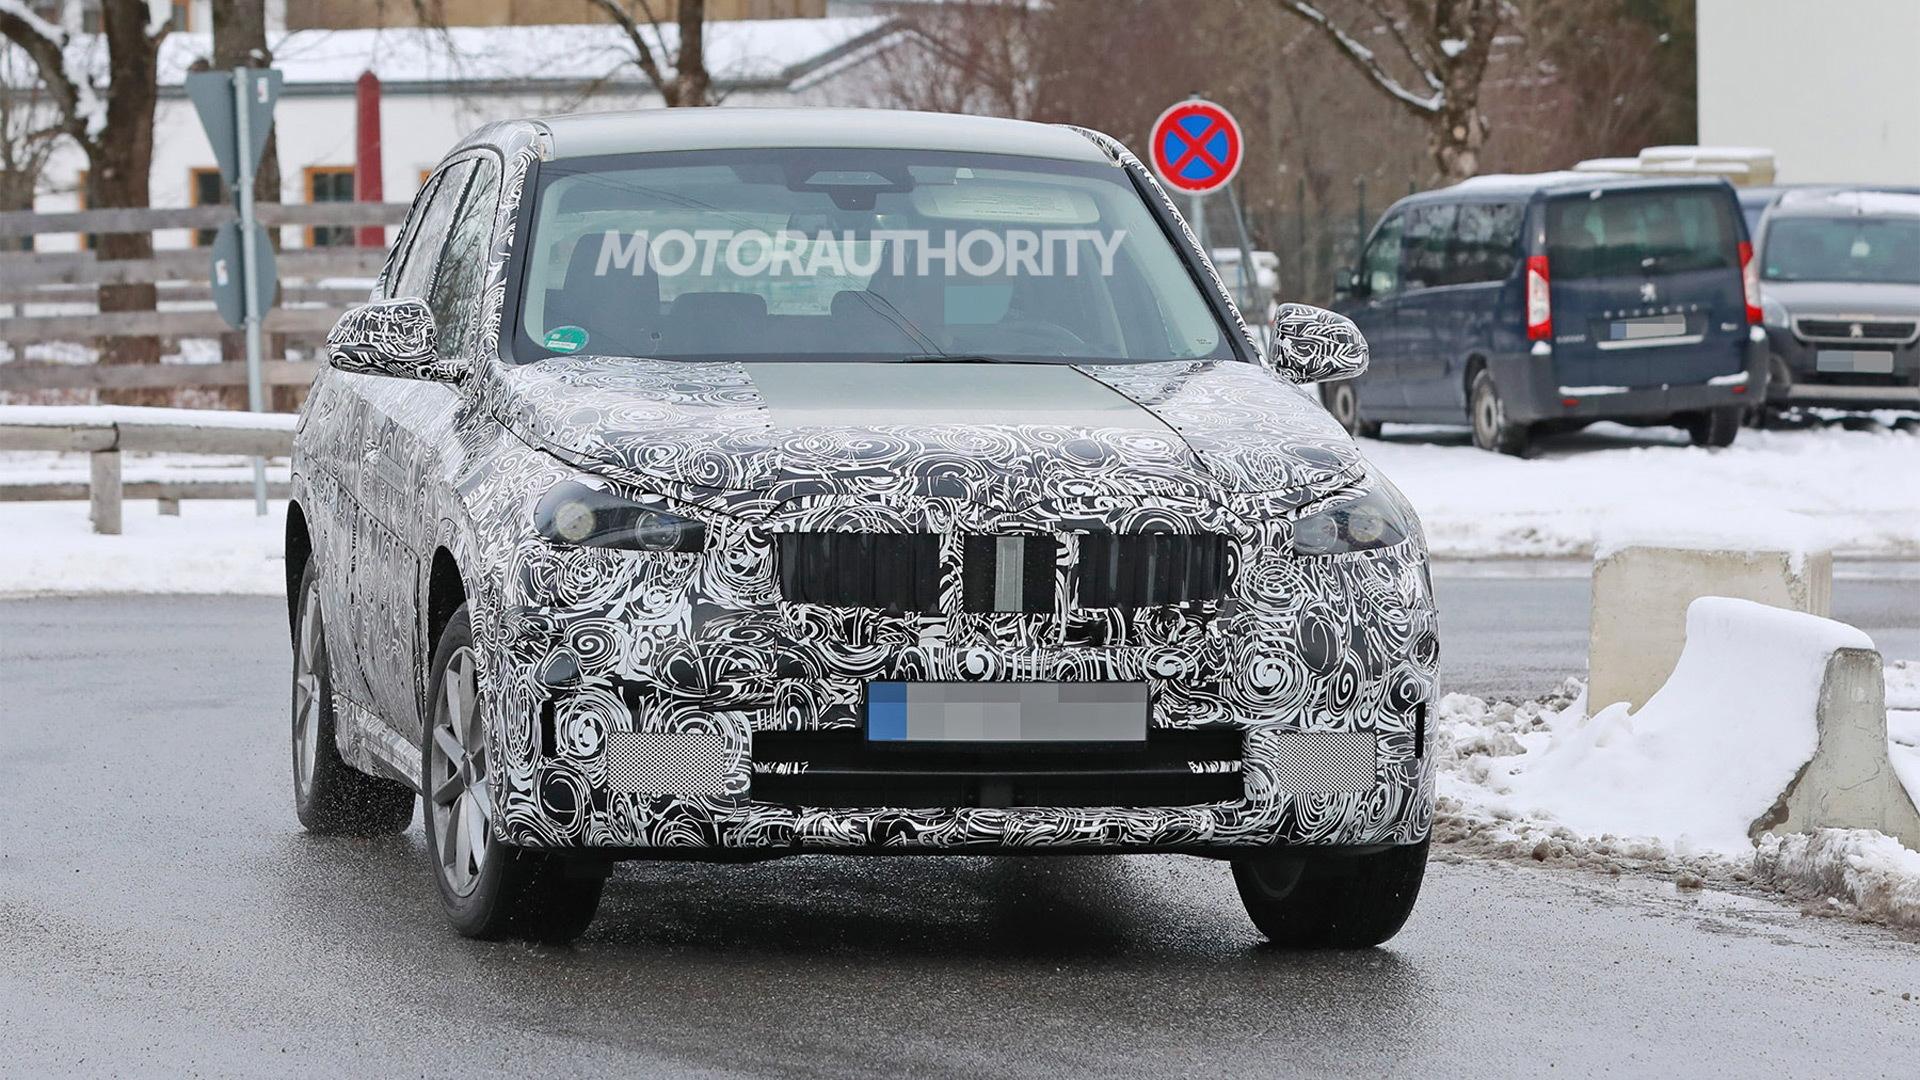 2023 BMW iX1 spy shots - Photo credit:S. Baldauf/SB-Medien